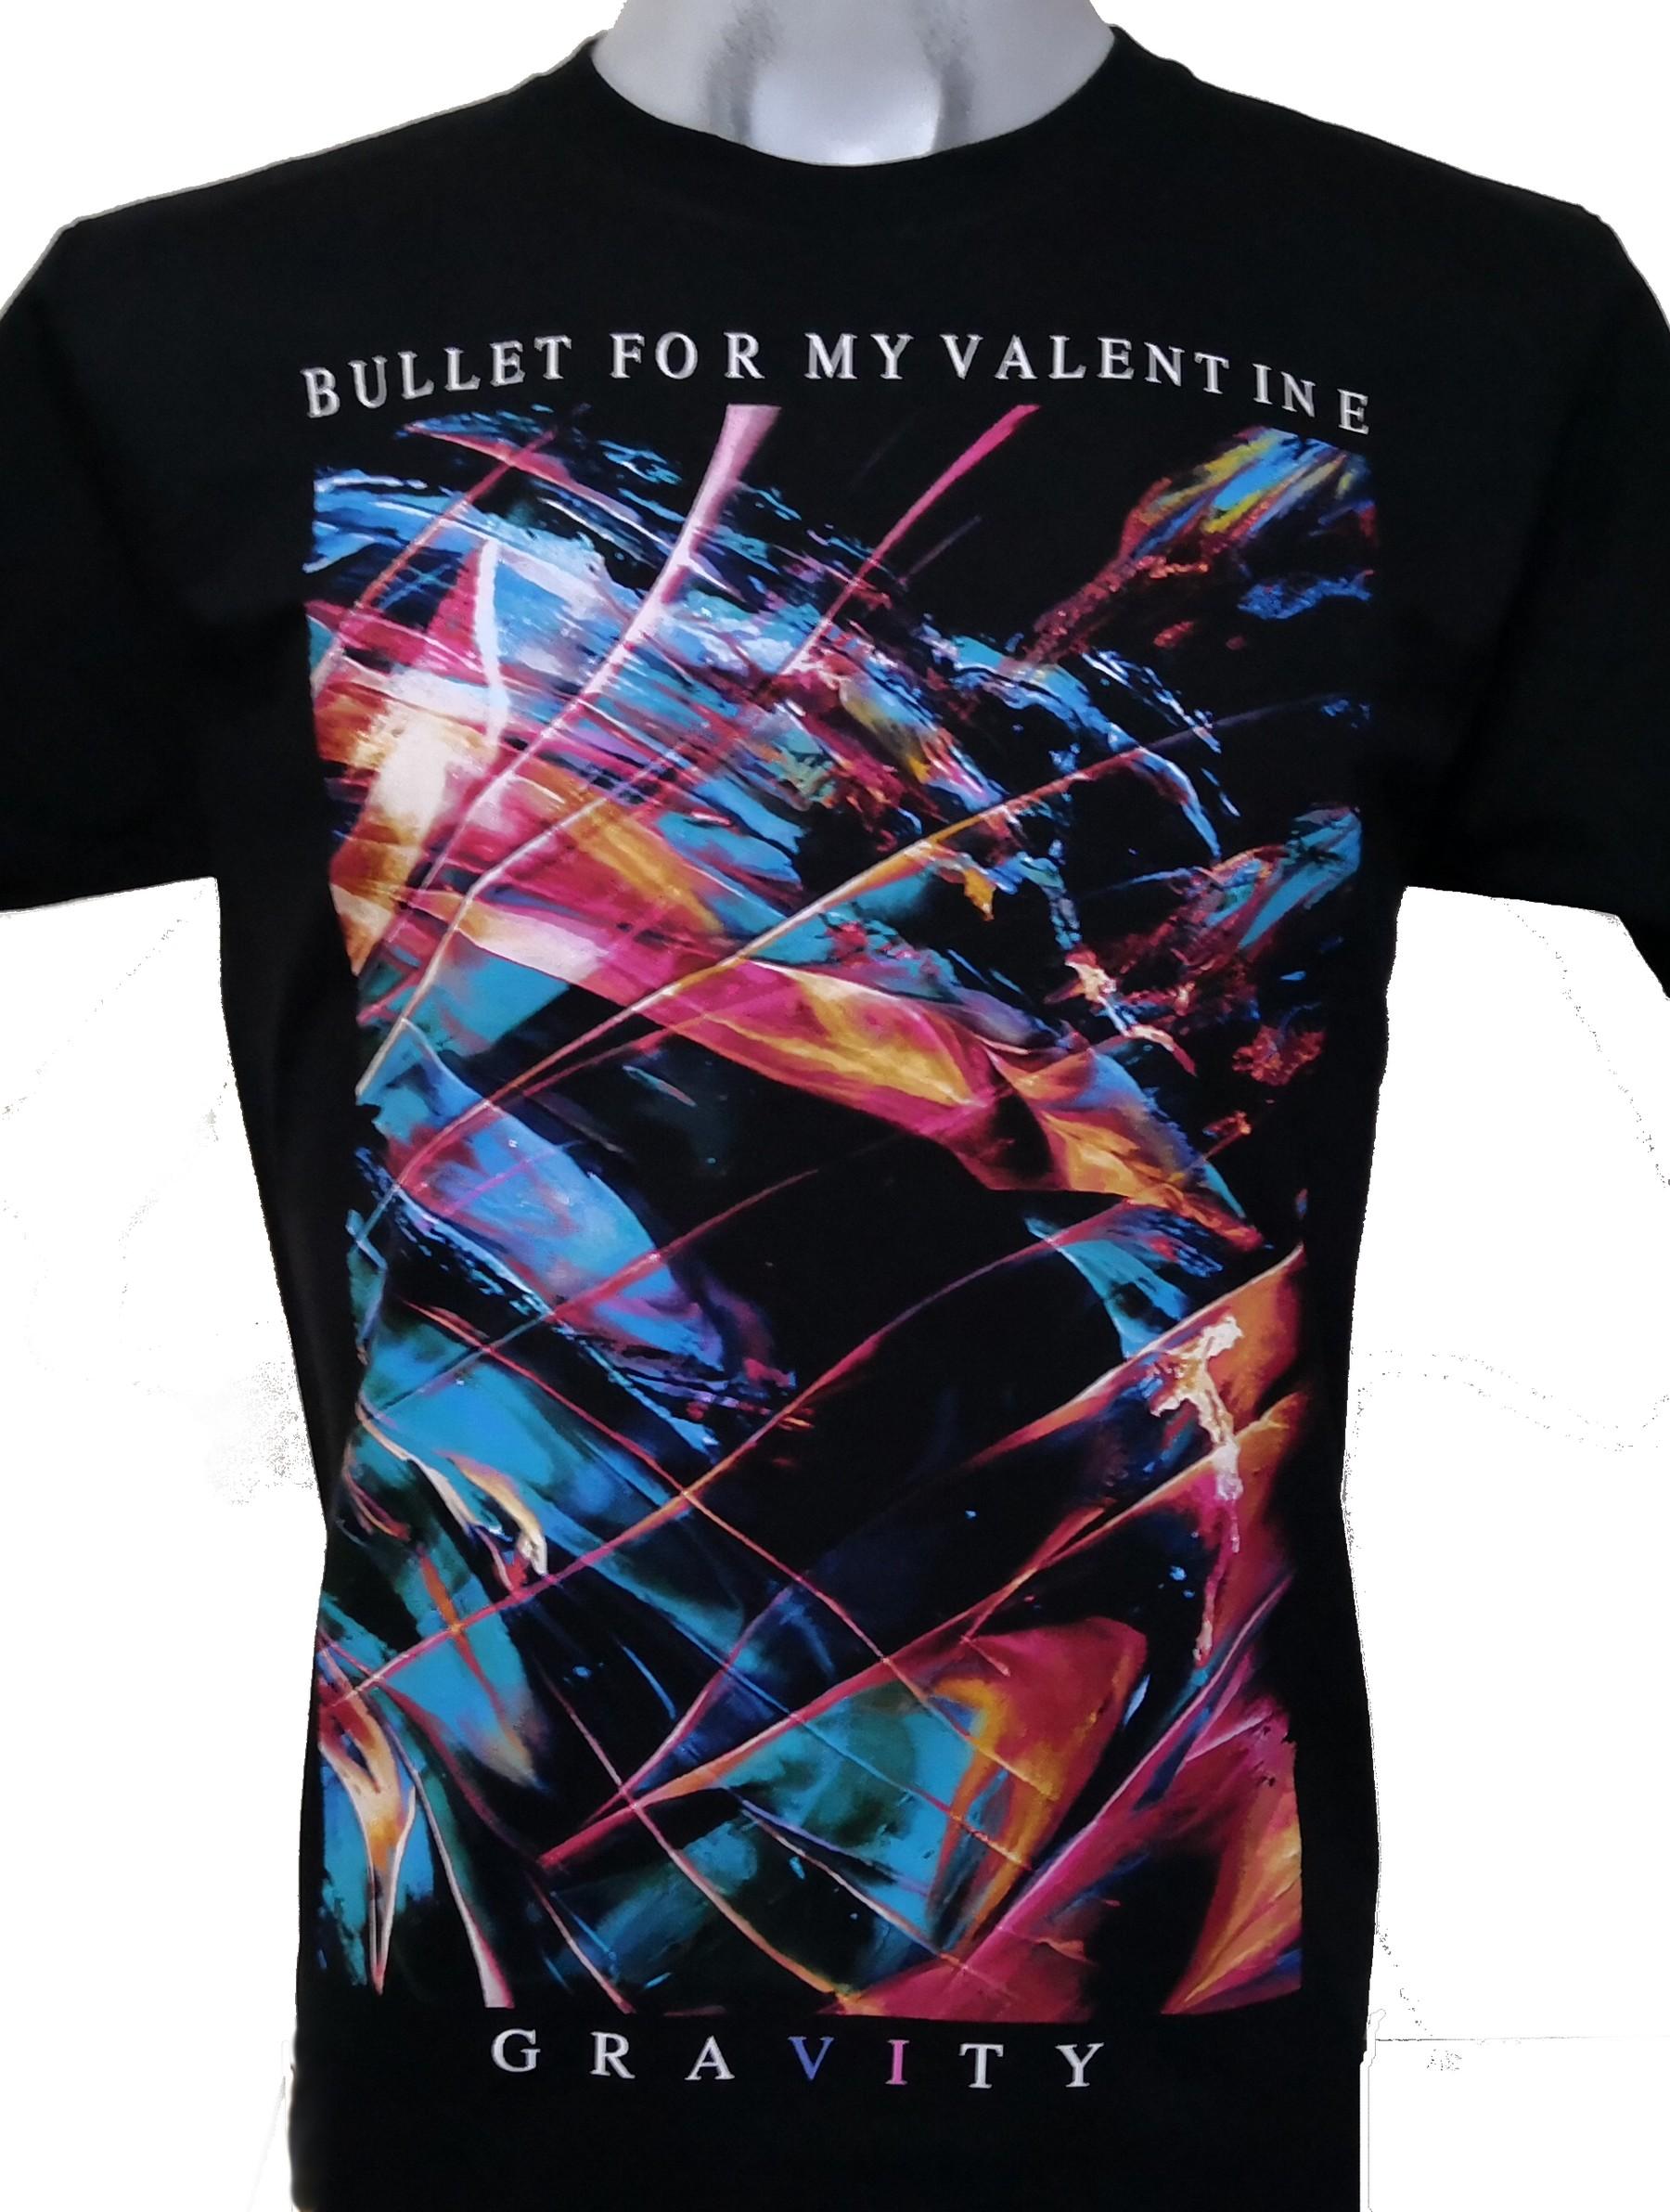 Bullet For My Valentine T Shirt Gravity Size L Roxxbkk Hoodie